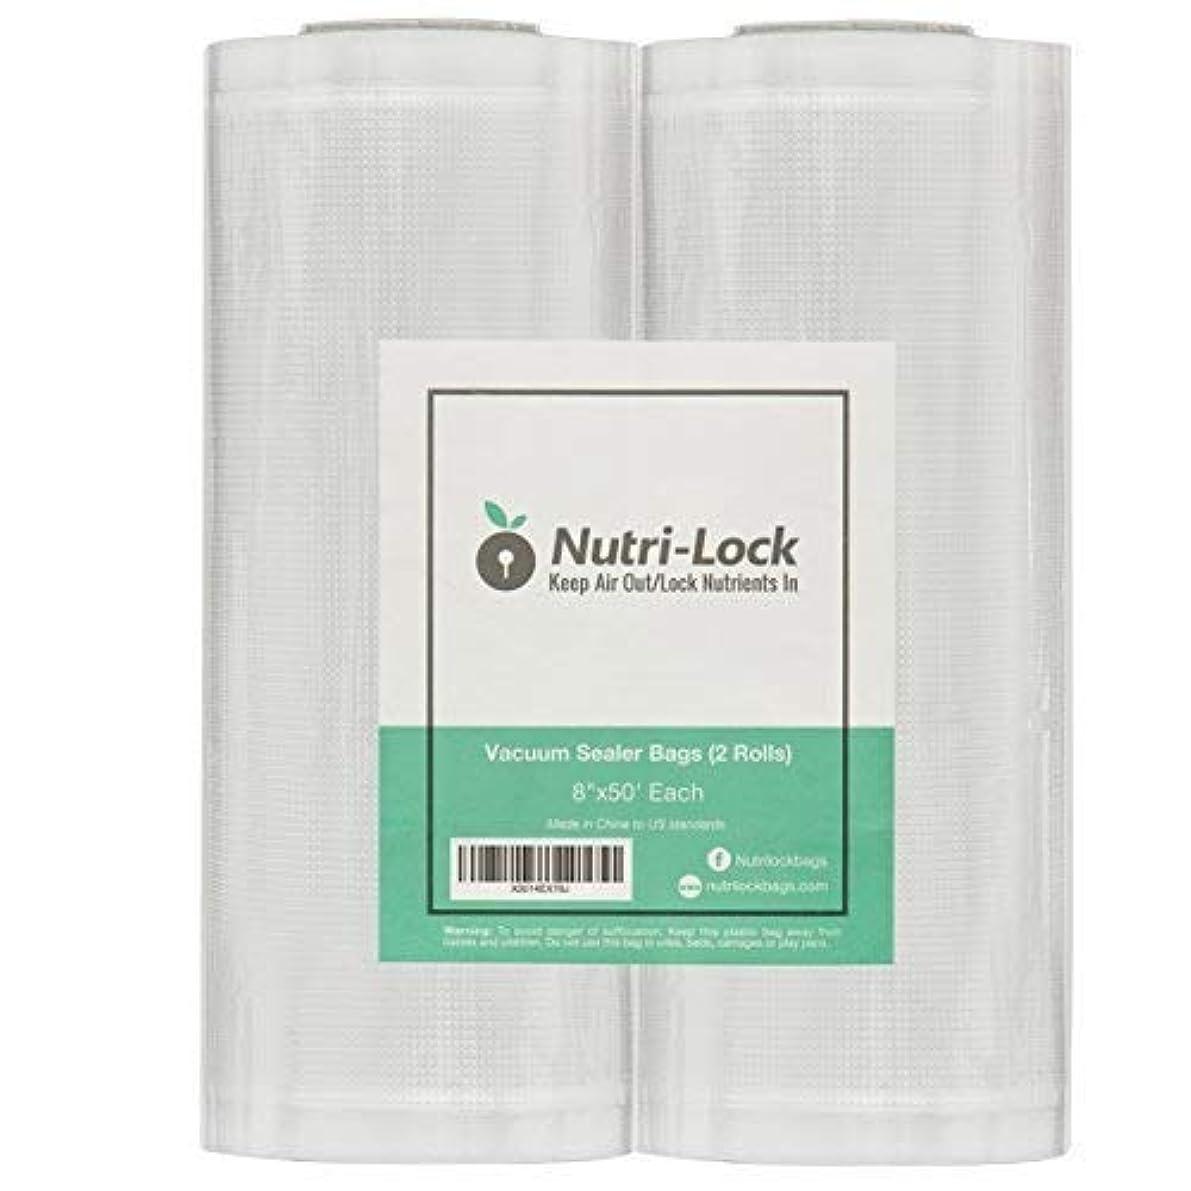 Nutri-Lock Vacuum Sealer Bags. 2 Pack 8x50 Commercial Grade Sealer Rolls for FoodSaver, Sous Vide